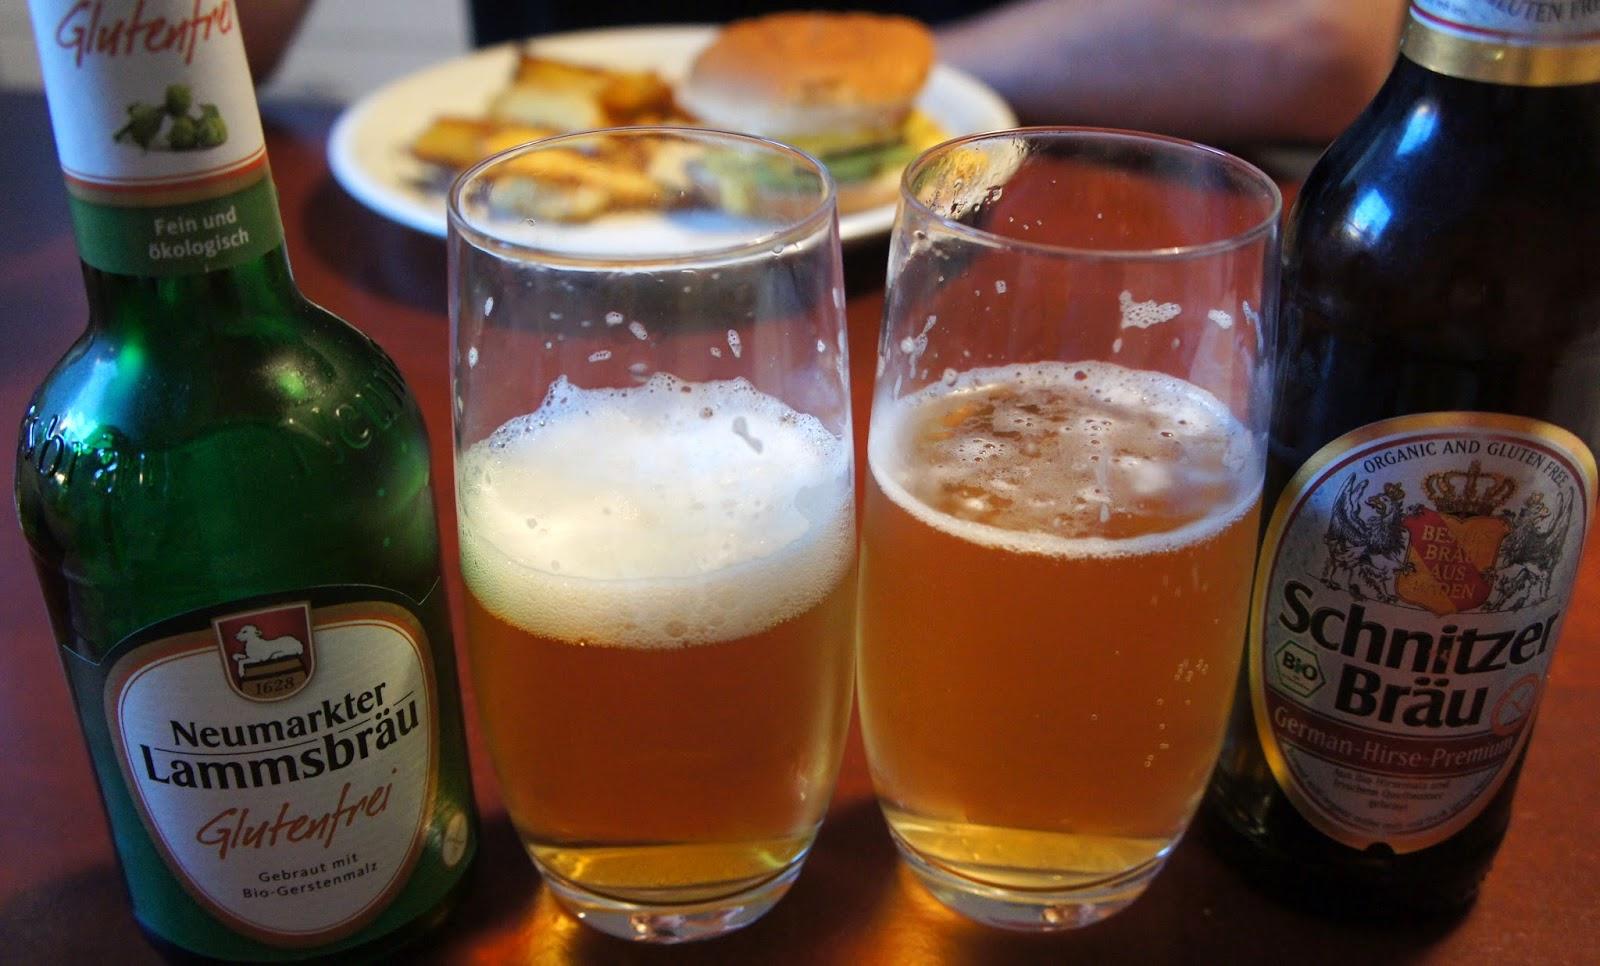 wieviel hefe ist im bier